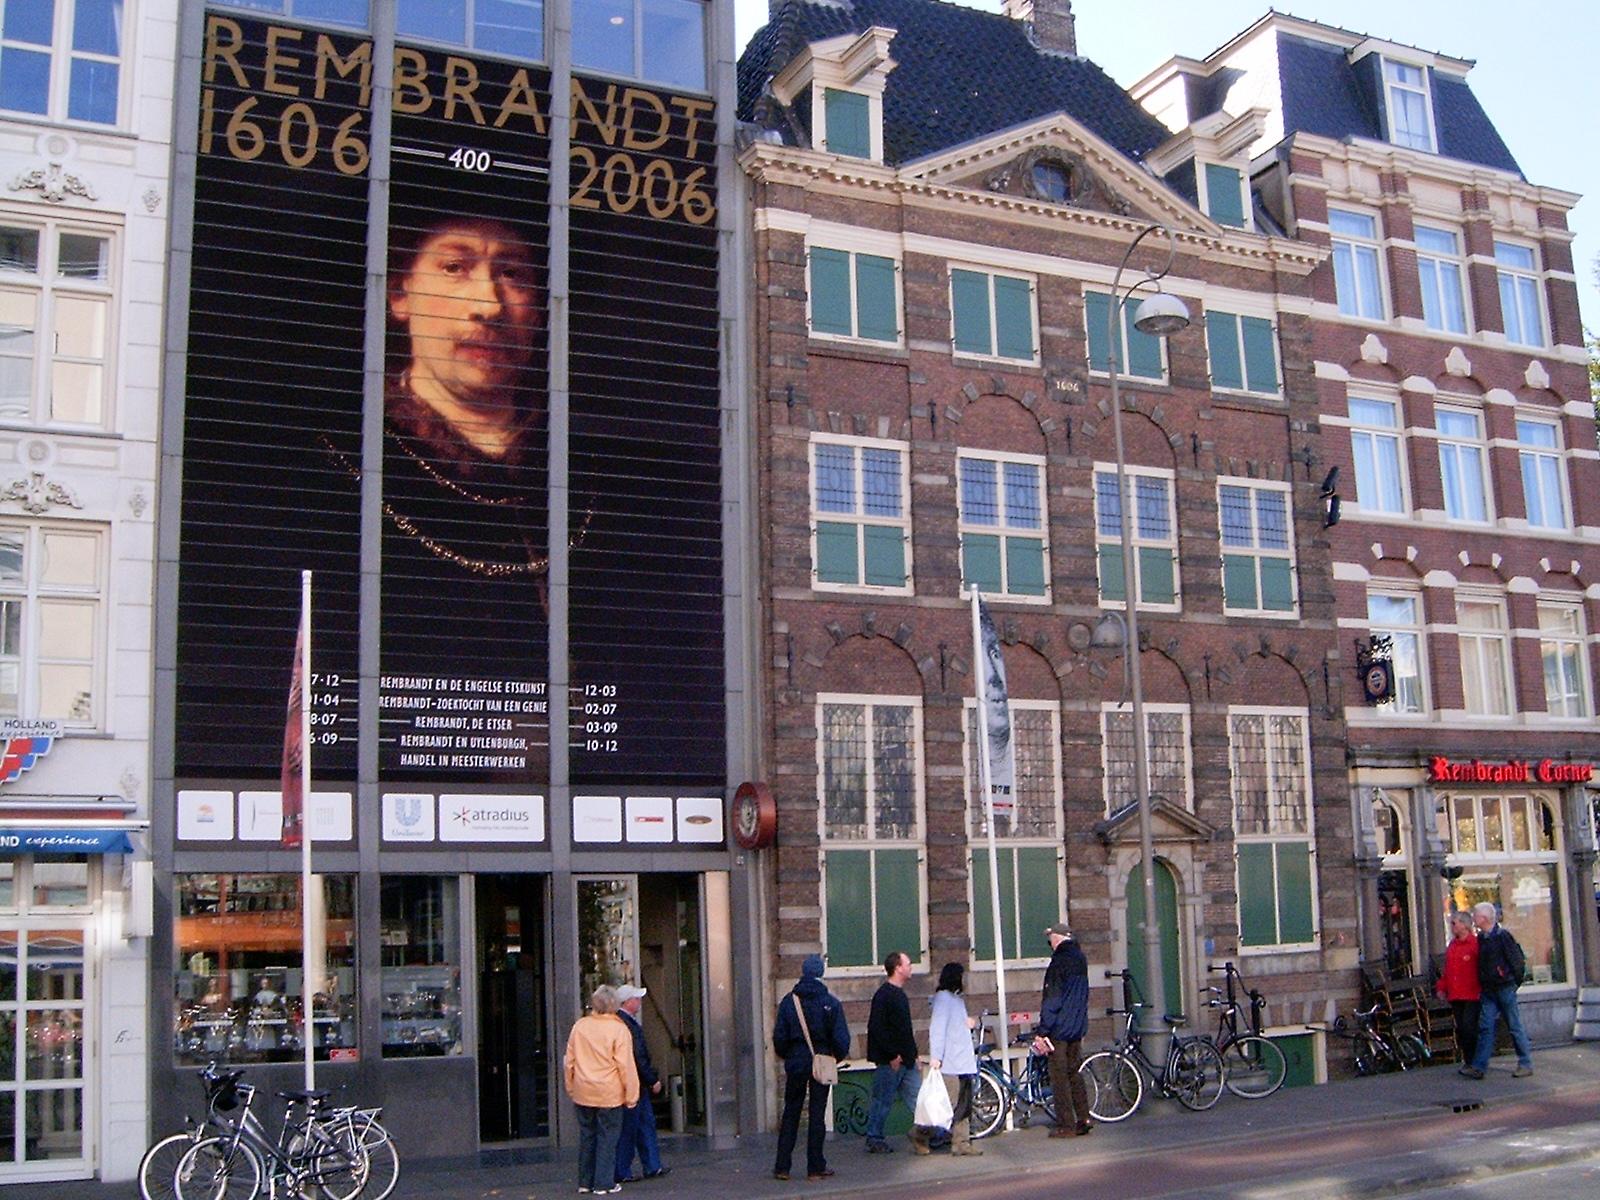 Rembrandt Ház (Rembrandt Huis)